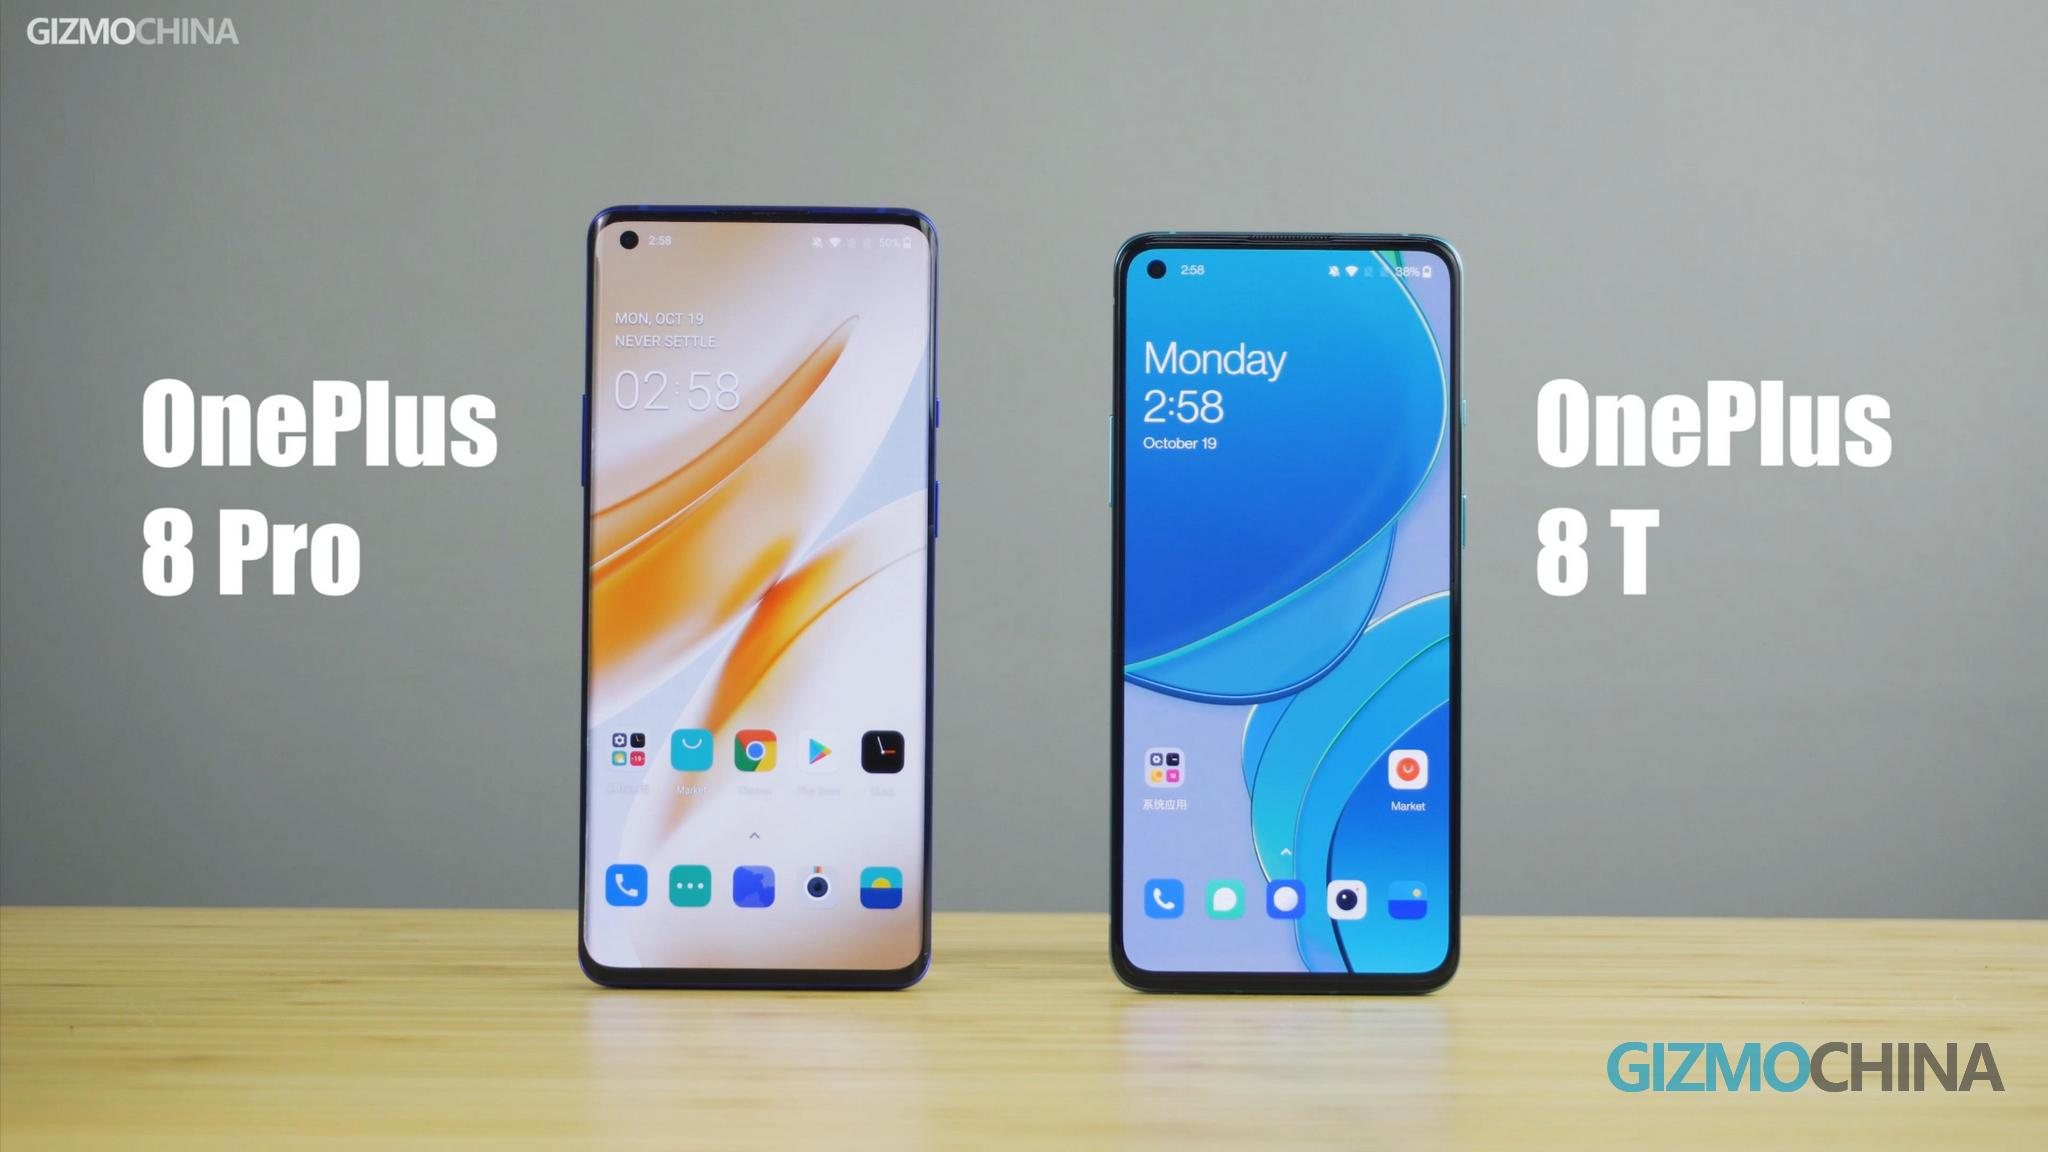 OnePlus 8T vs 8 Pro